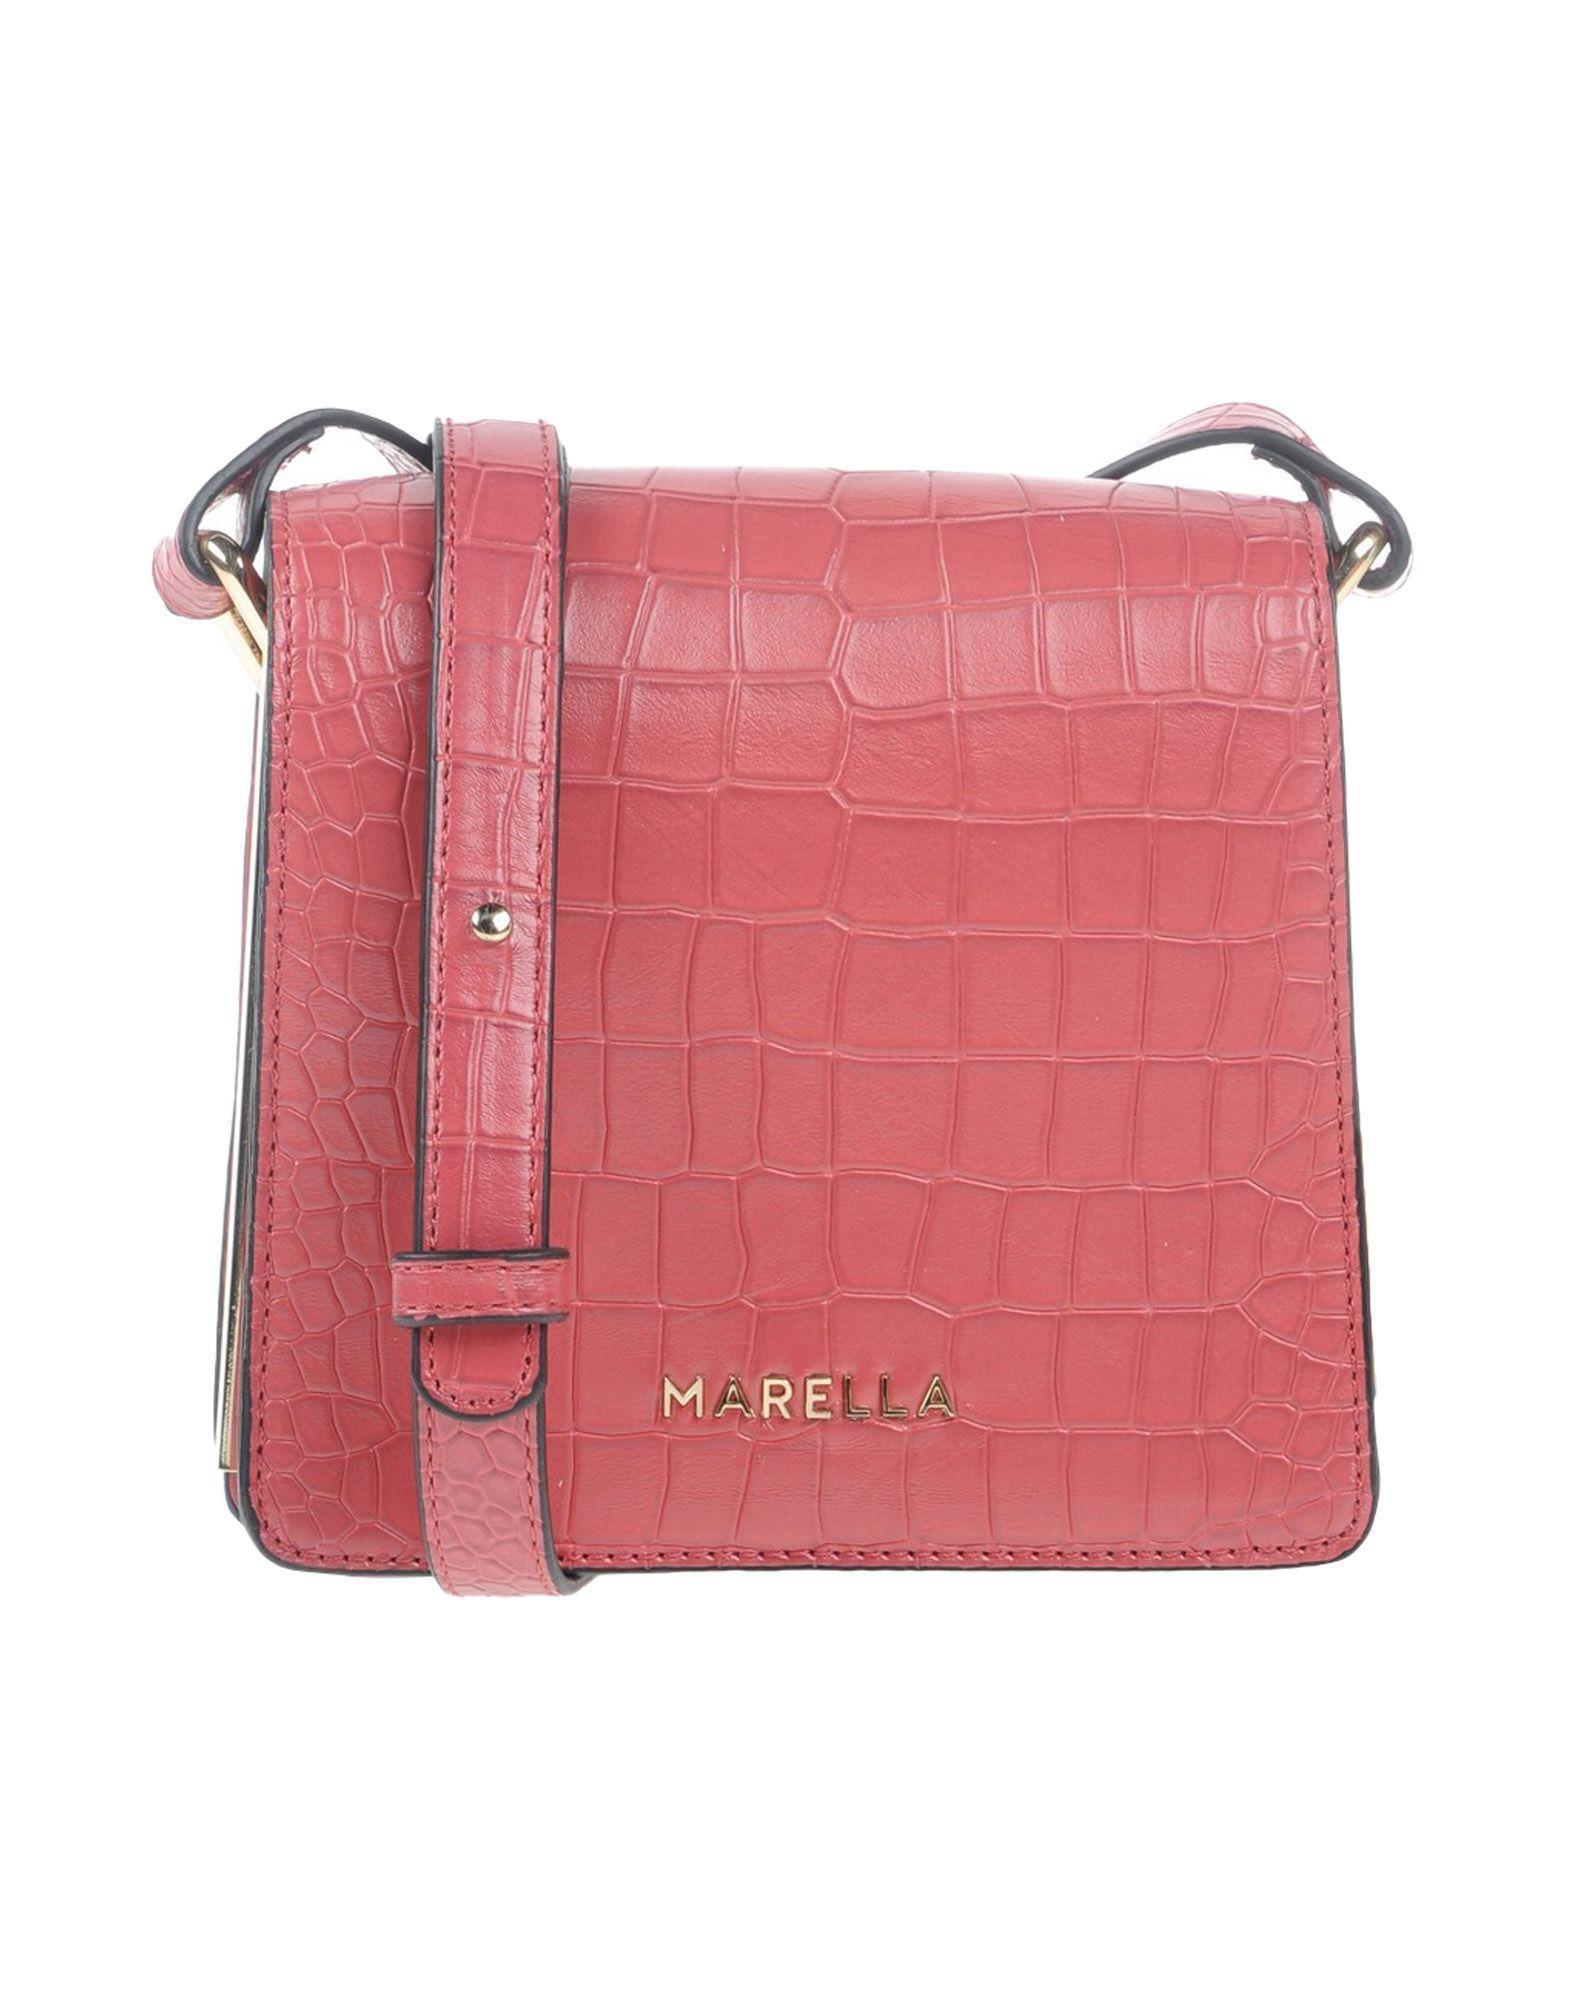 Tipe e Tacchi HANDBAGS - Cross-body bags su YOOX.COM xp010iY1